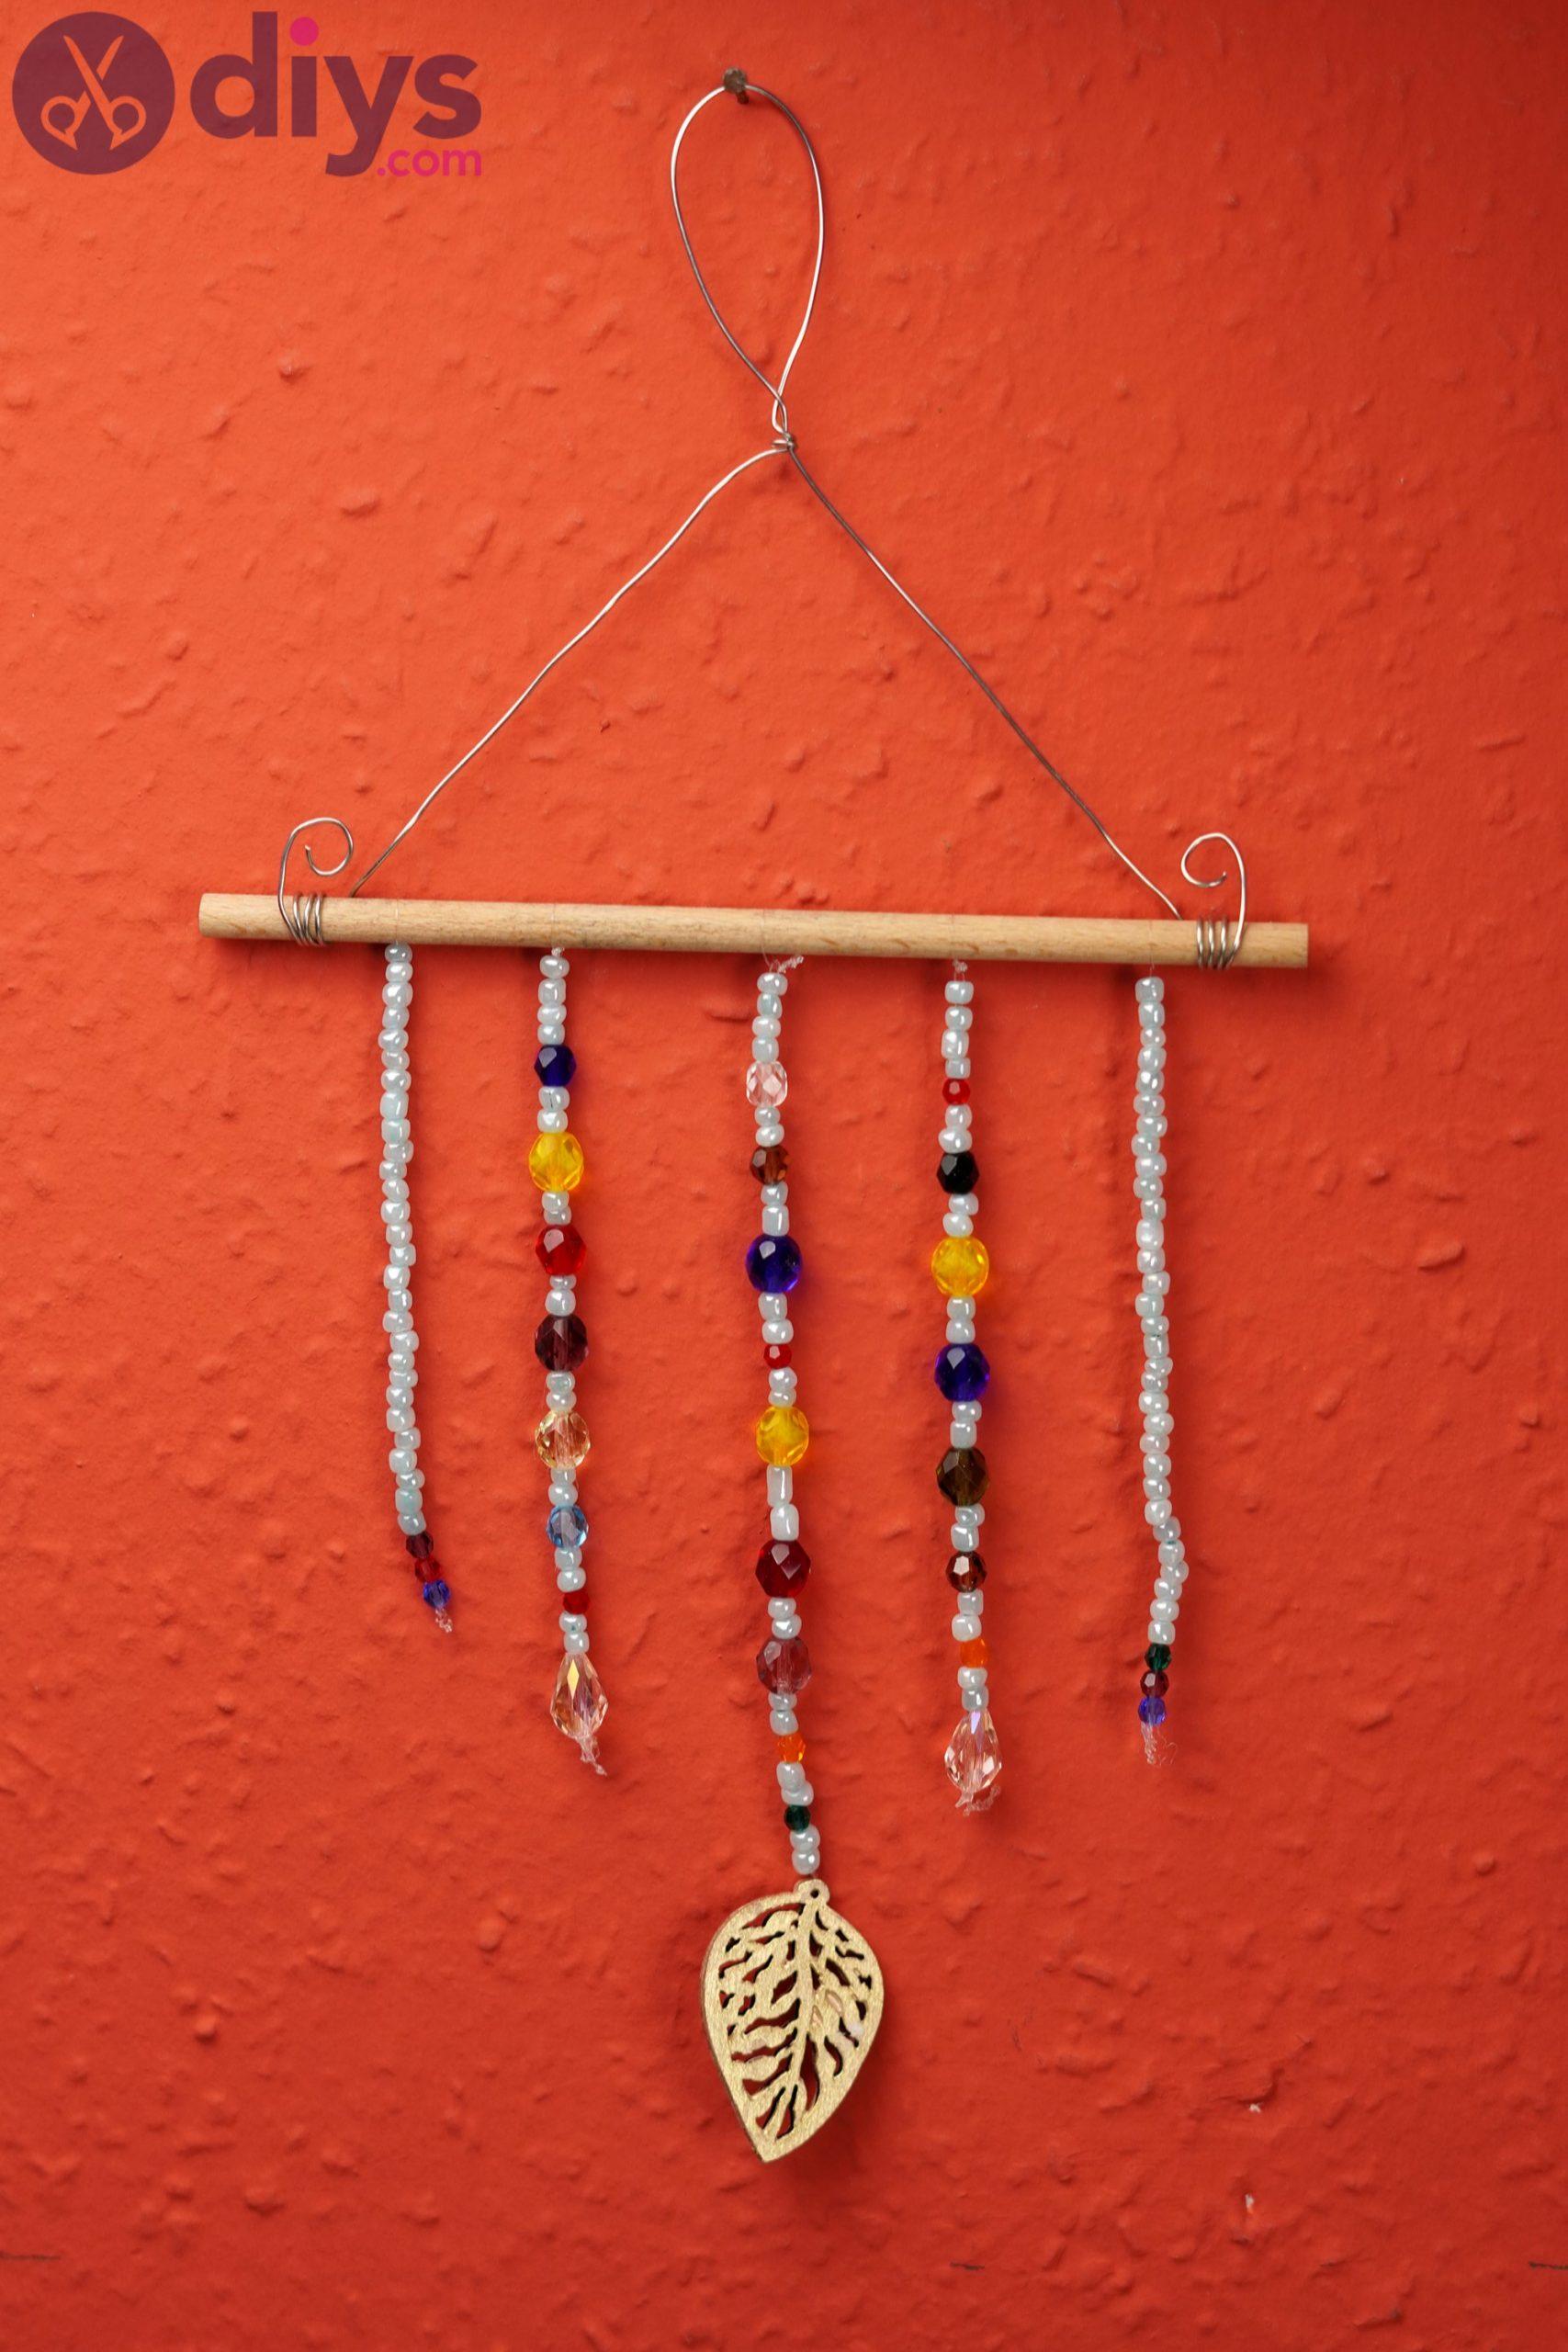 Beaded wall hanger photos (2)